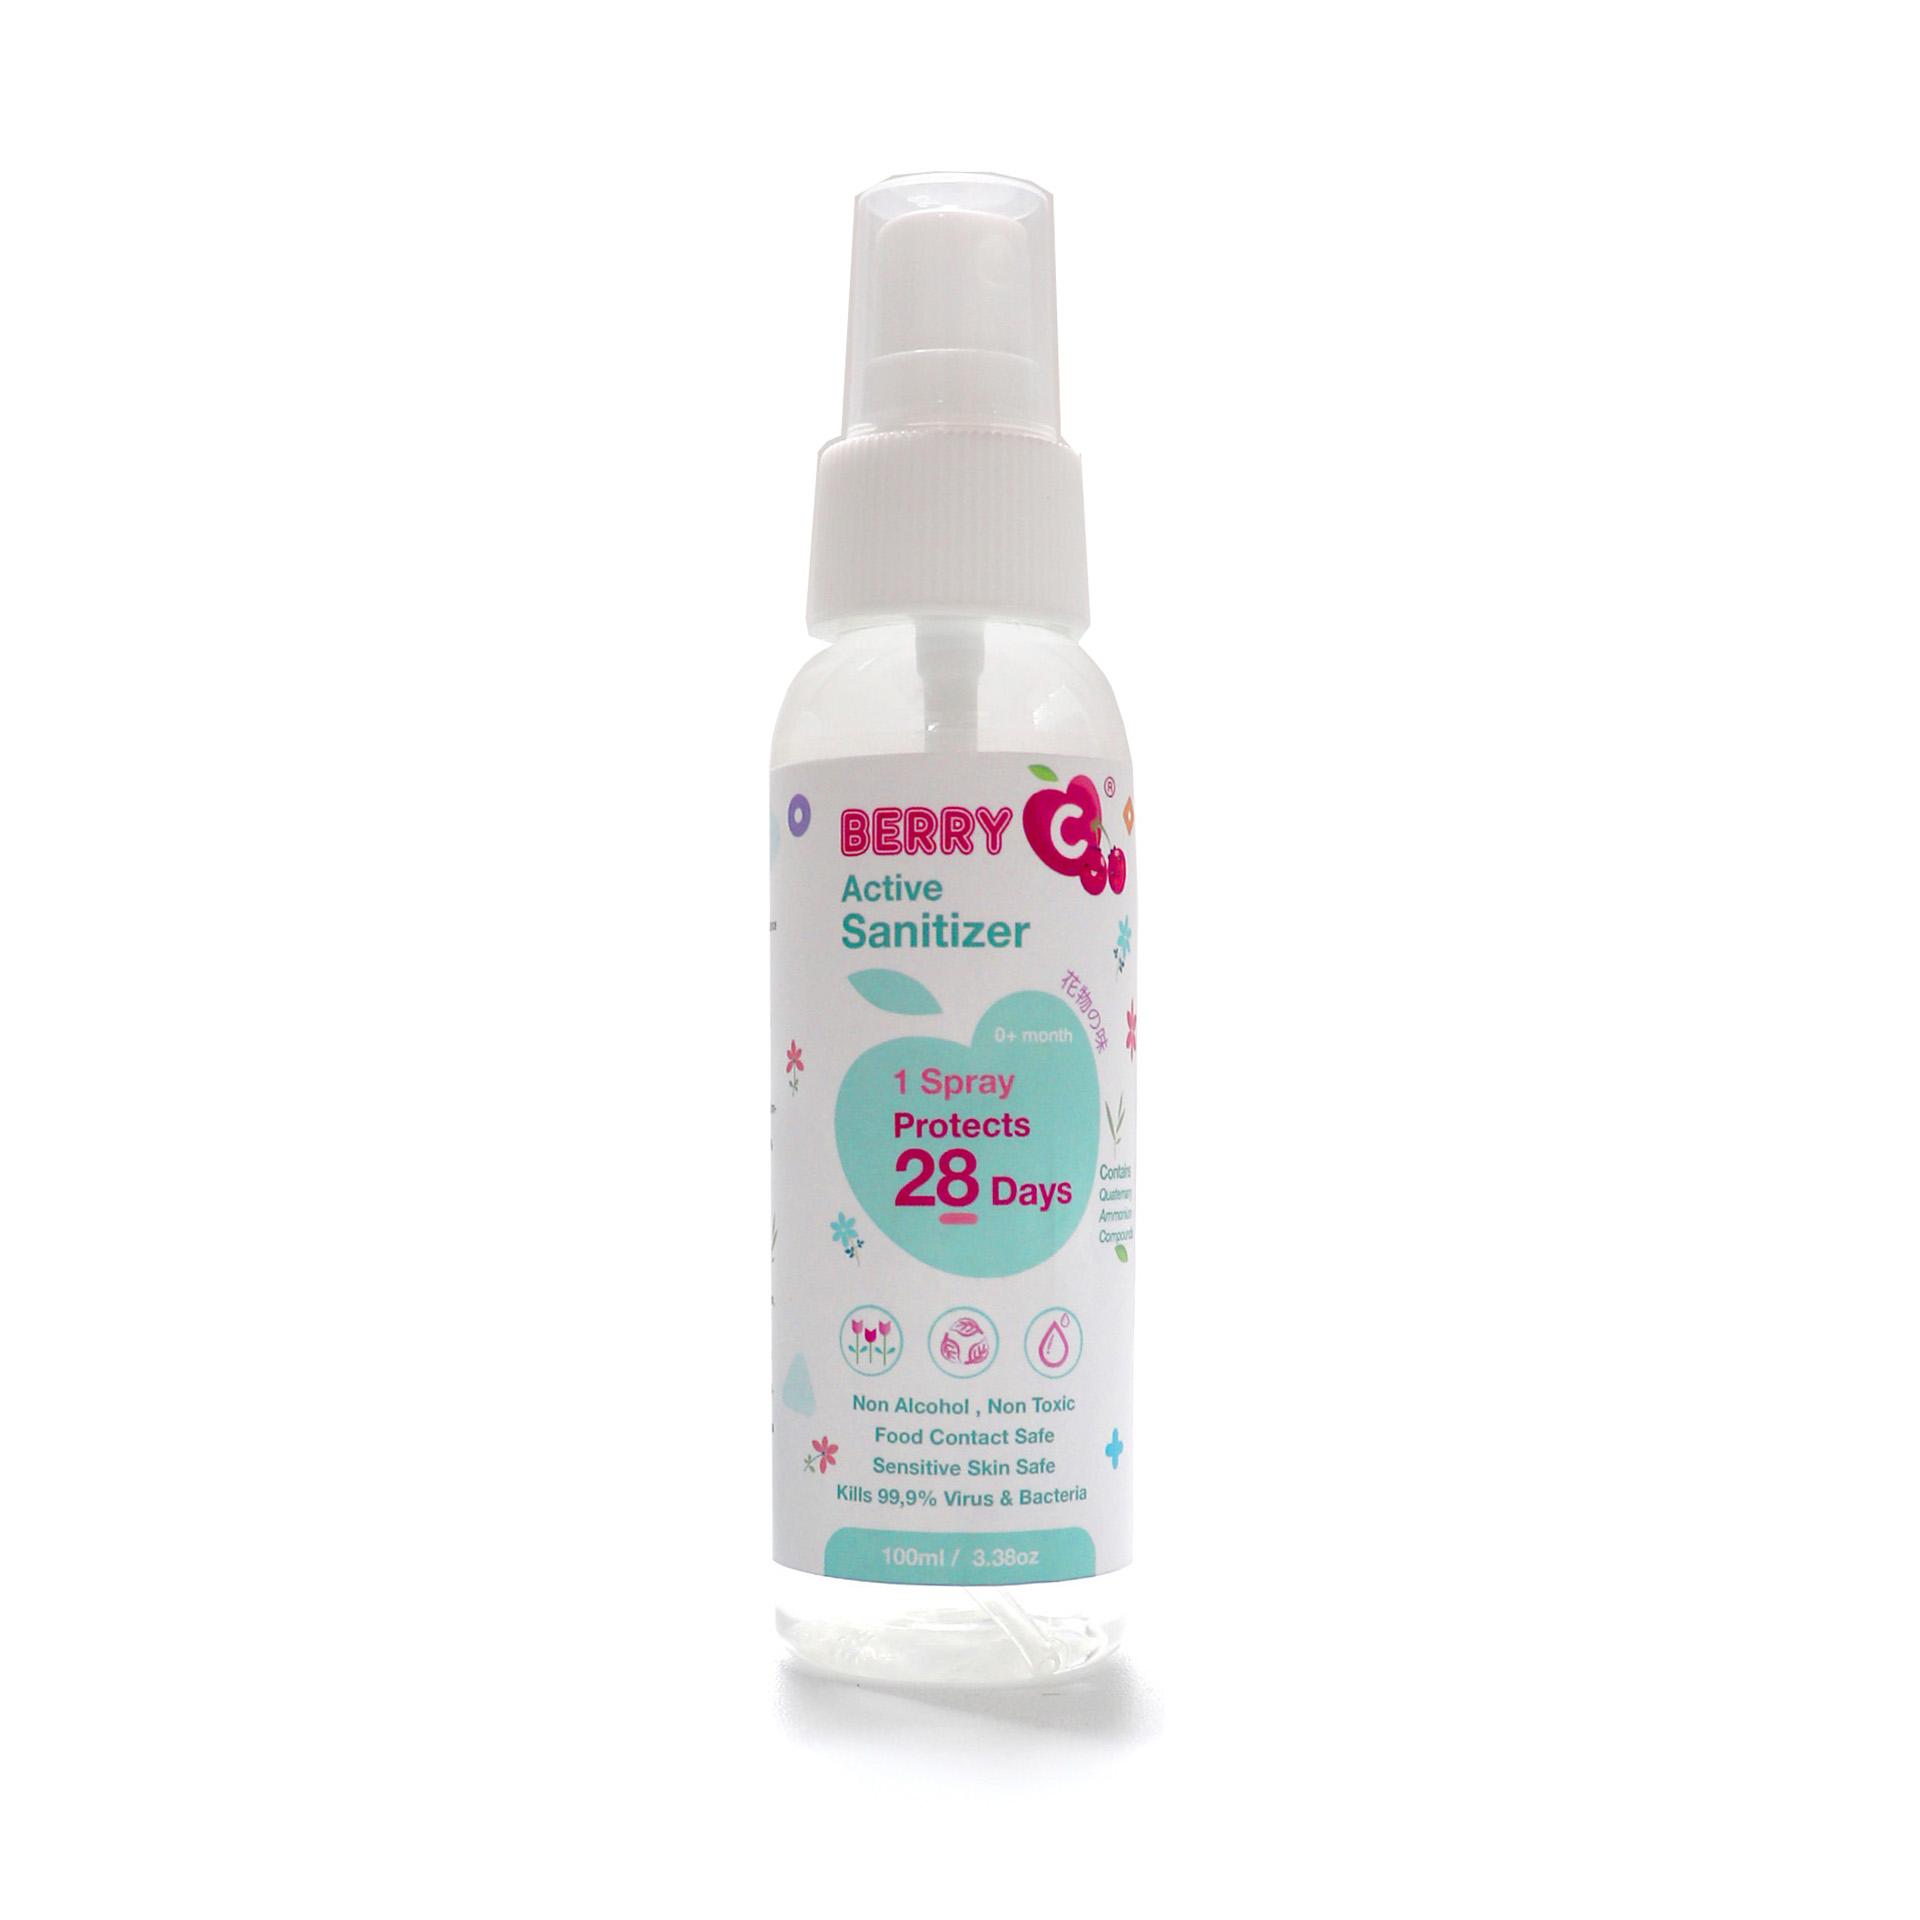 TEVO BerryC Sanitizer Disinfectant Aktif Active